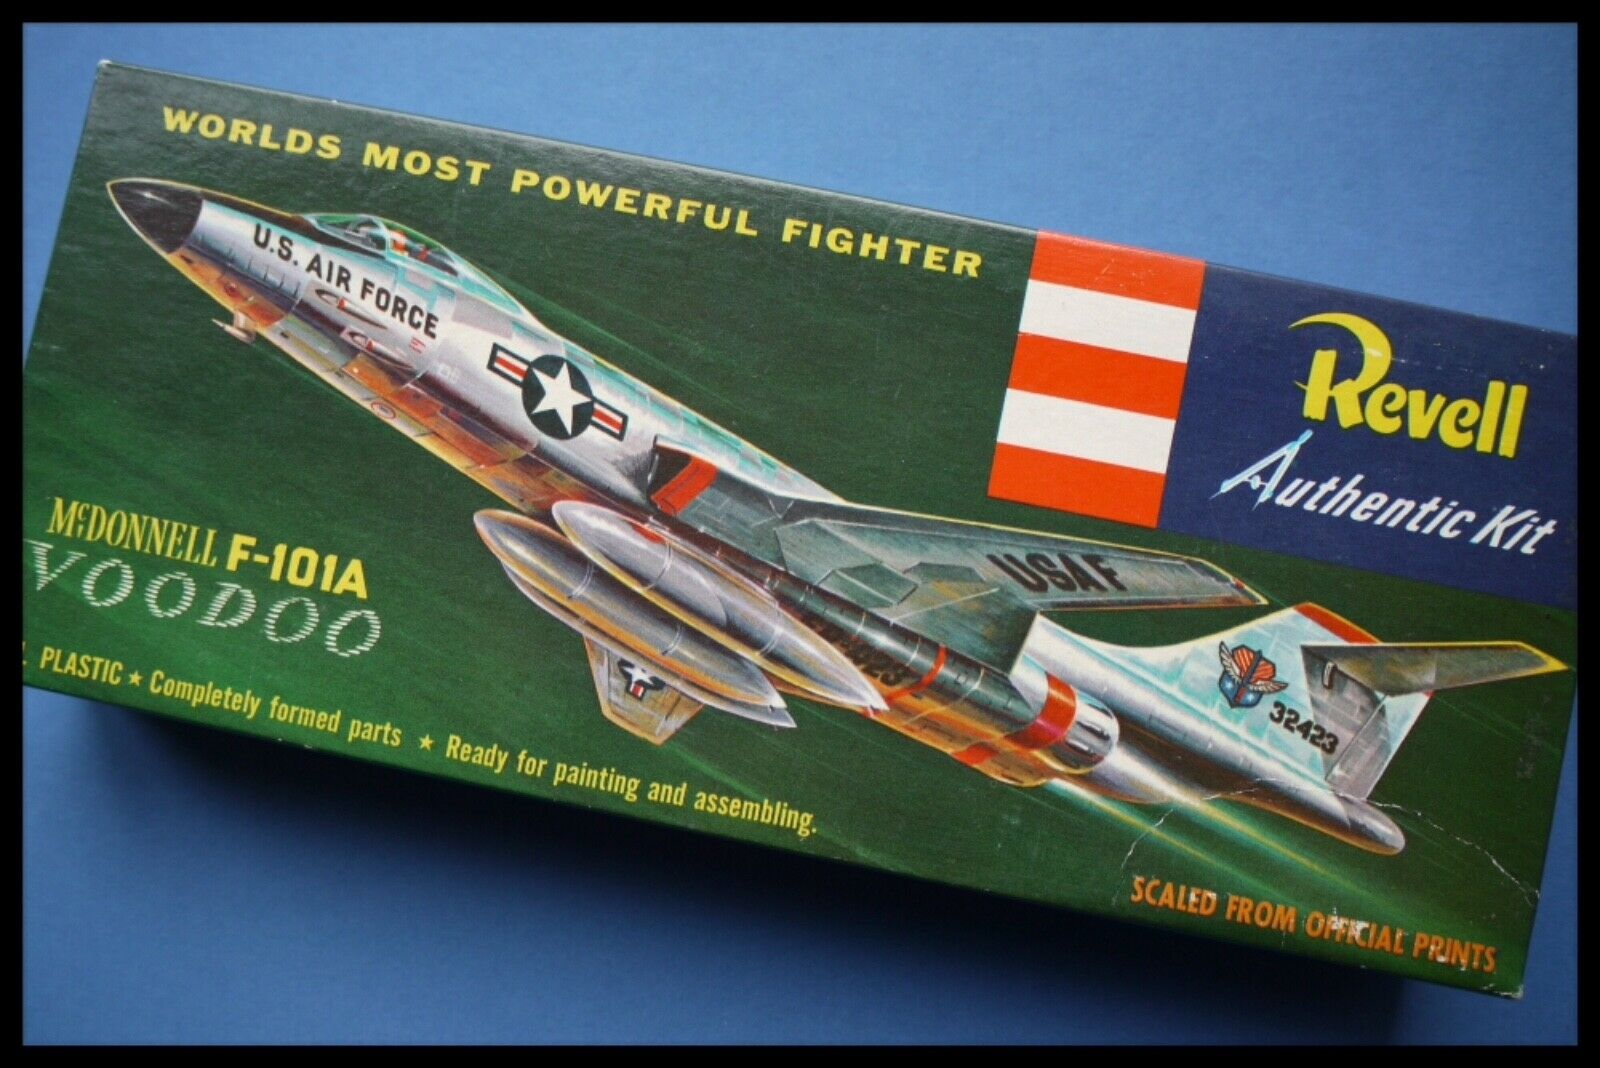 Rare 1956 First Issue TypeS Revell McDonnell F101A Interceptor Plastic Model Kit